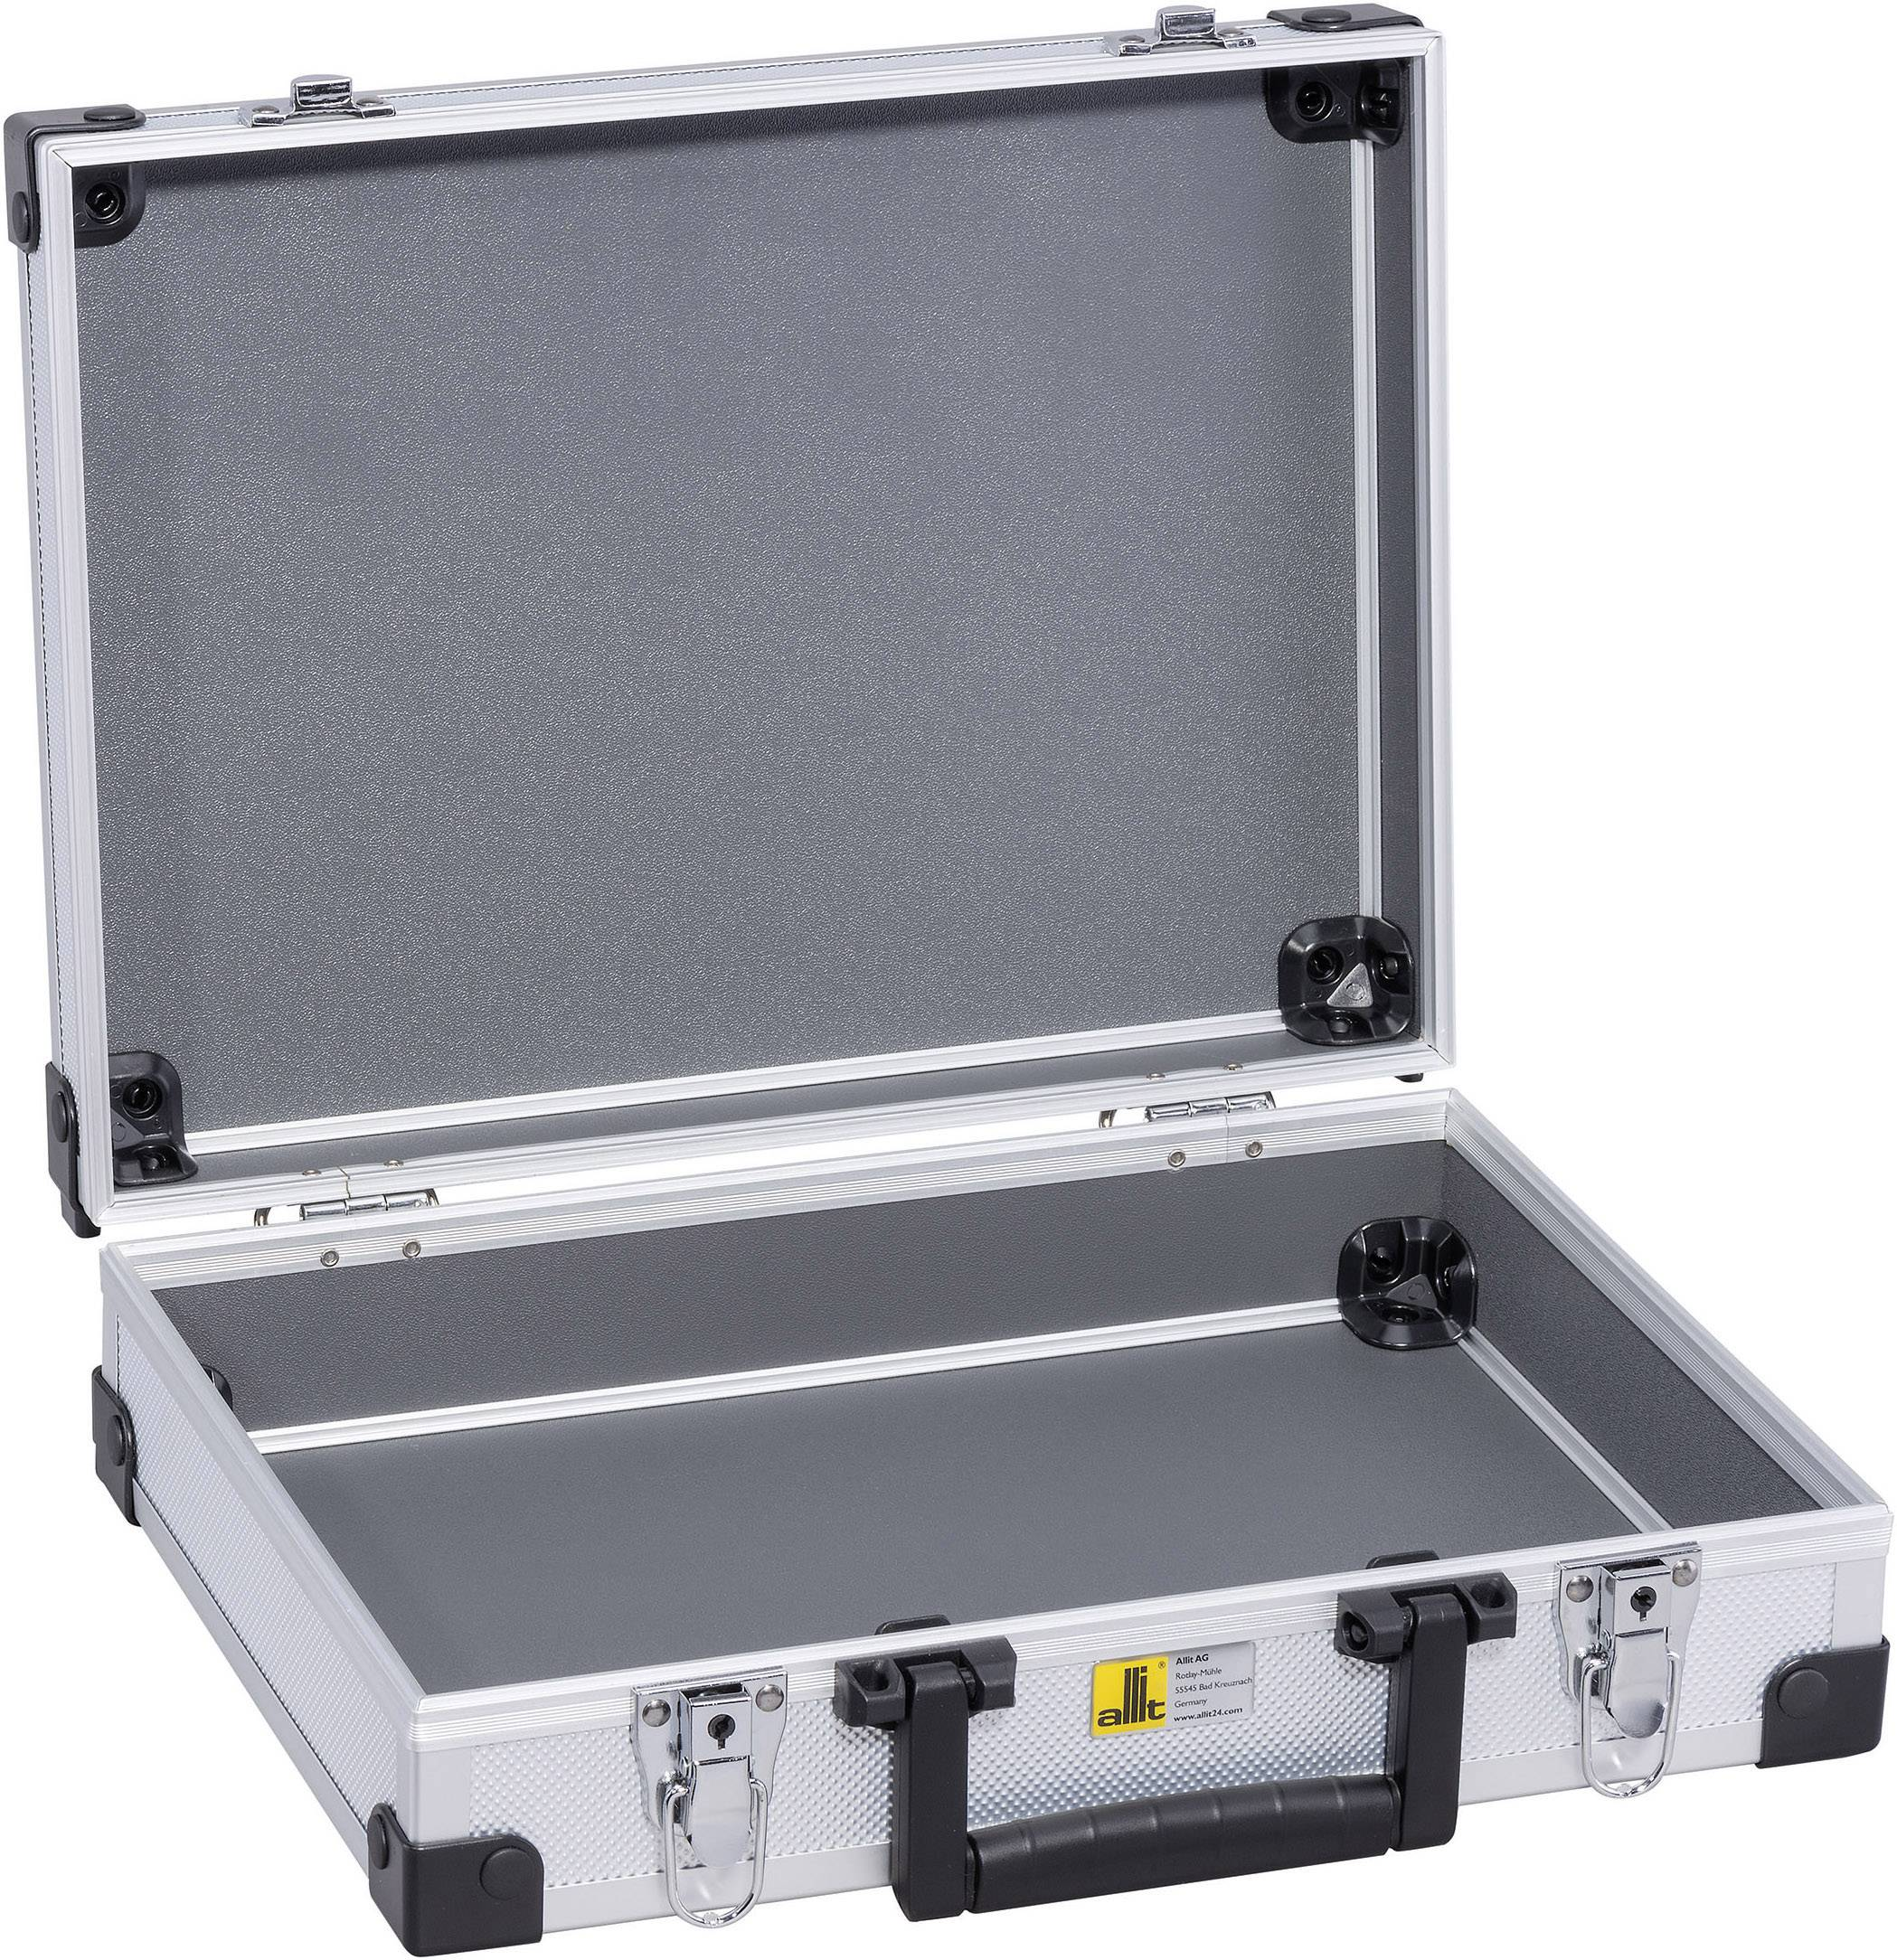 Kufrík na náradie Allit AluPlus Basic L 35 424100, (d x š x v) 345 x 285 x 105 mm